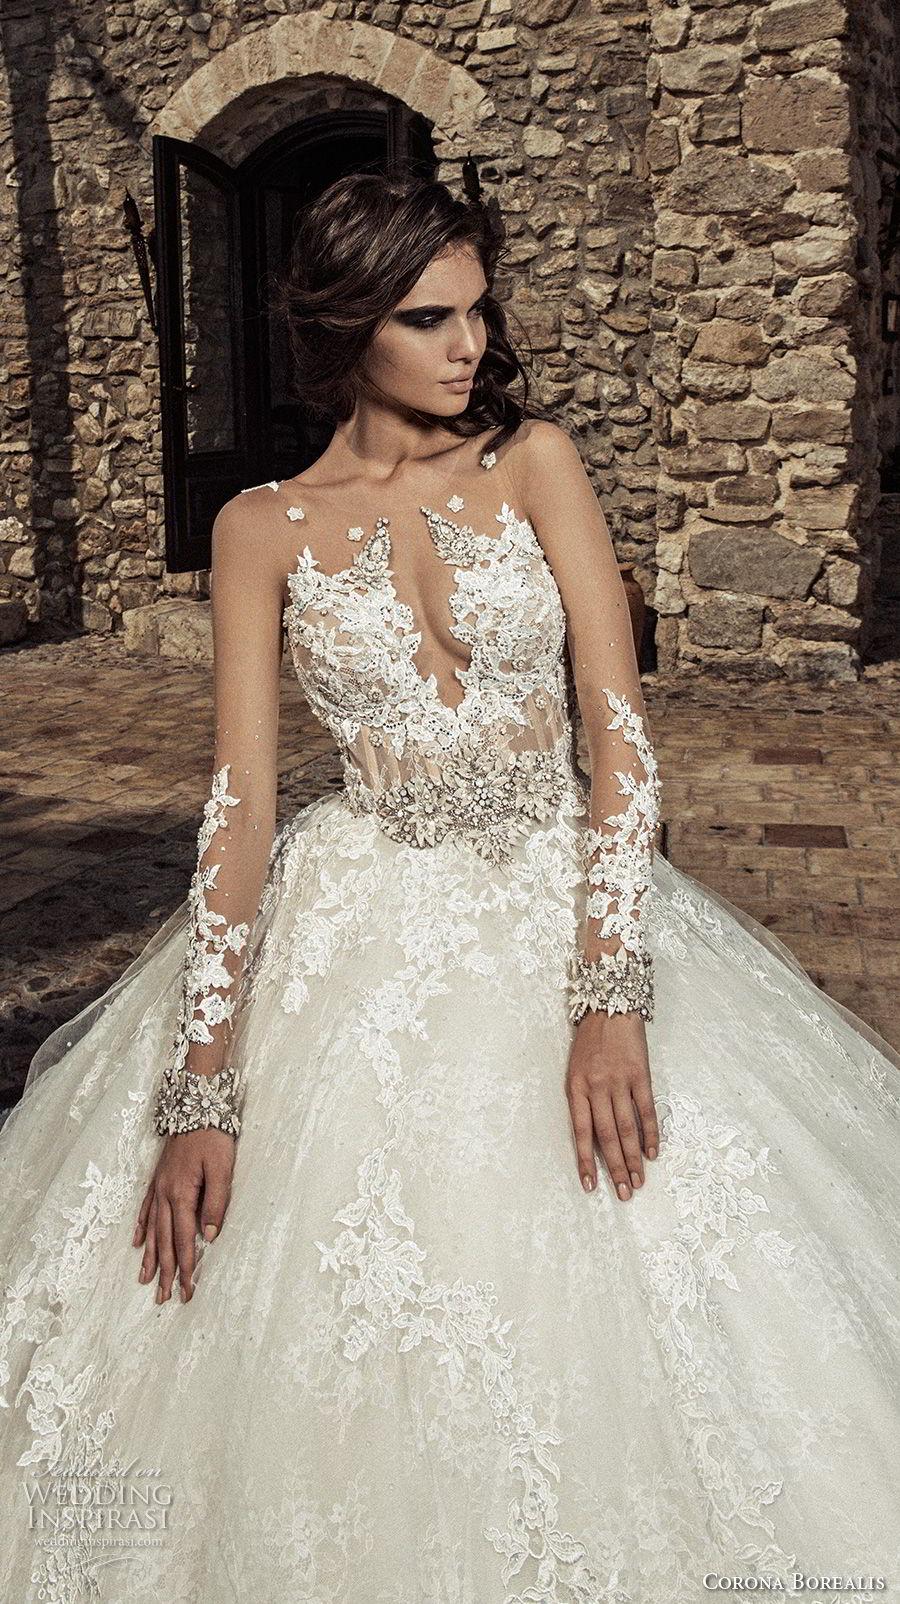 corona borealis 2018 bridal long sleeves illusion jewel deep plunging sweetheart neckline full embellishment glamorous princess ball gown wedding dress sheer rasor back chapel train (10) zv